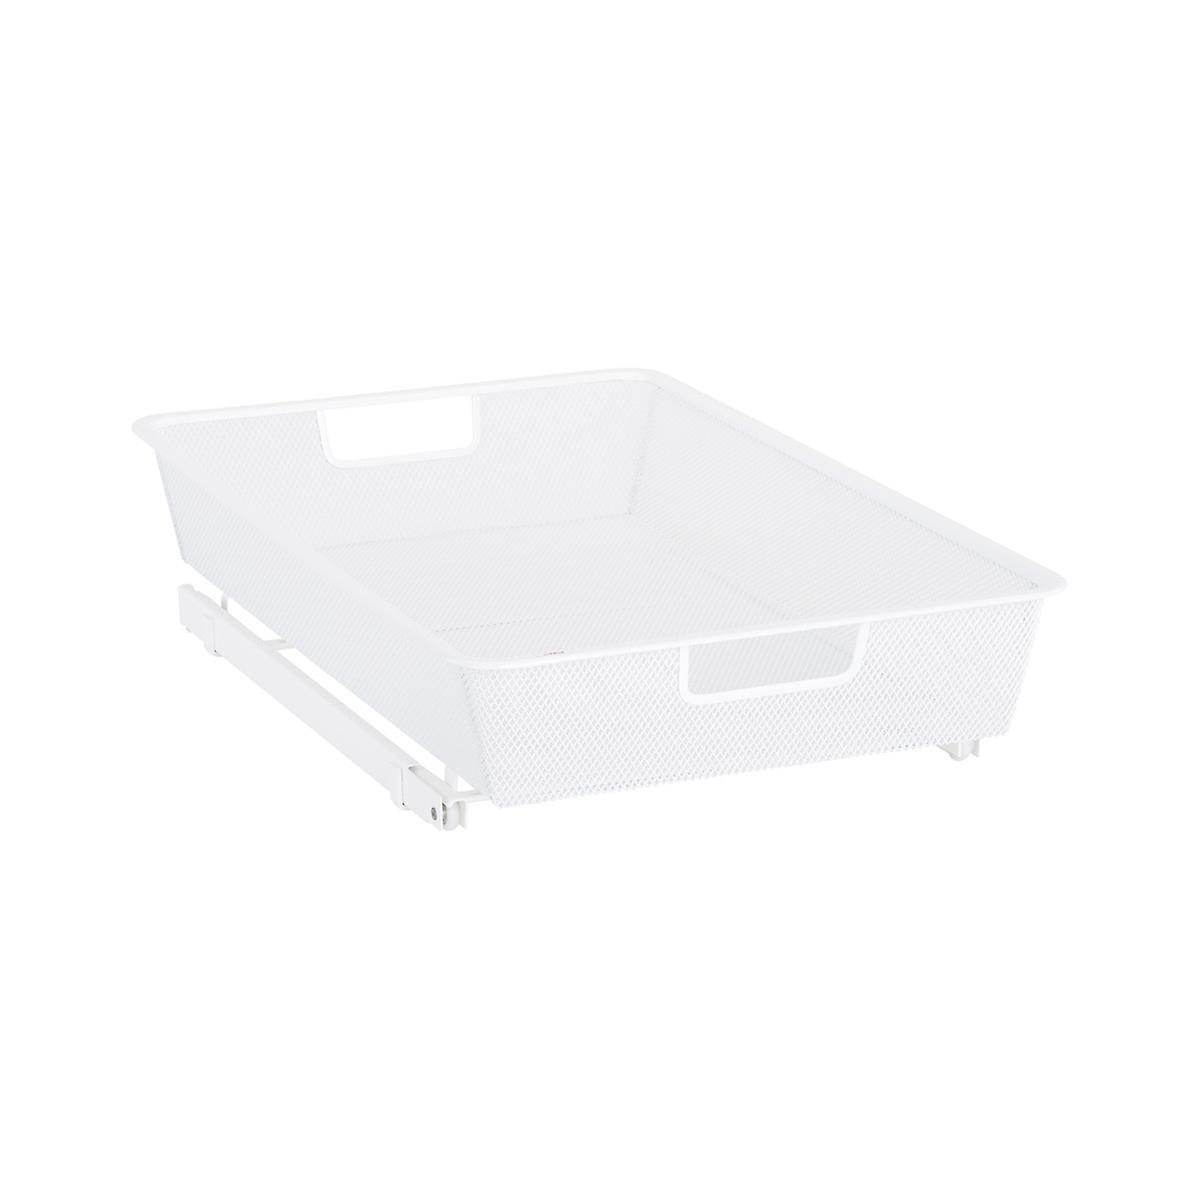 24a695ddbd7 White Mesh Food Storage   Lid Organizers